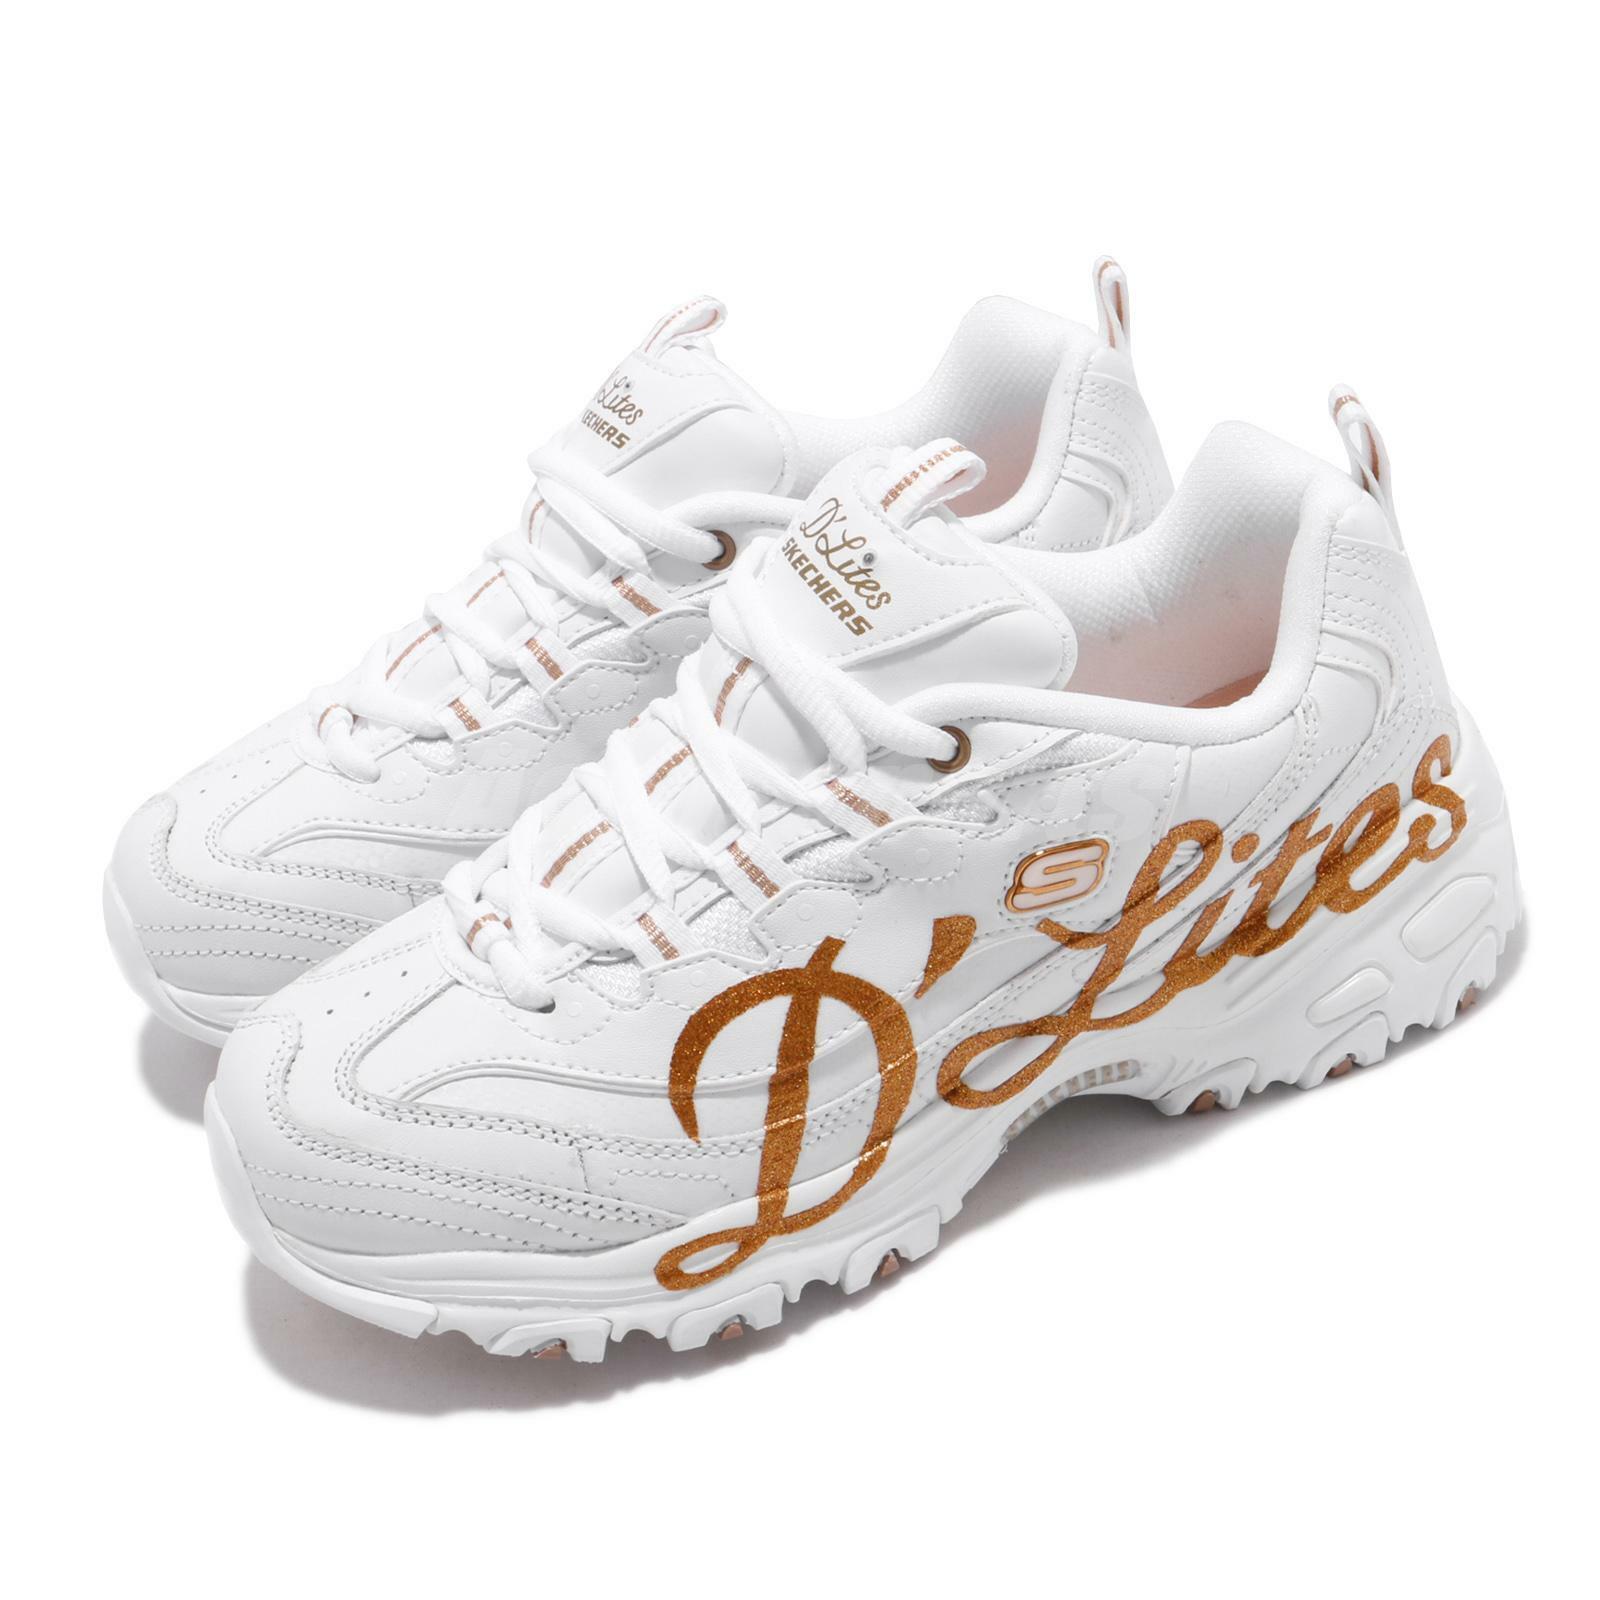 Skechers D Lites-Glitzy City White pink gold Women Lifestyle shoes 13165-WTRG